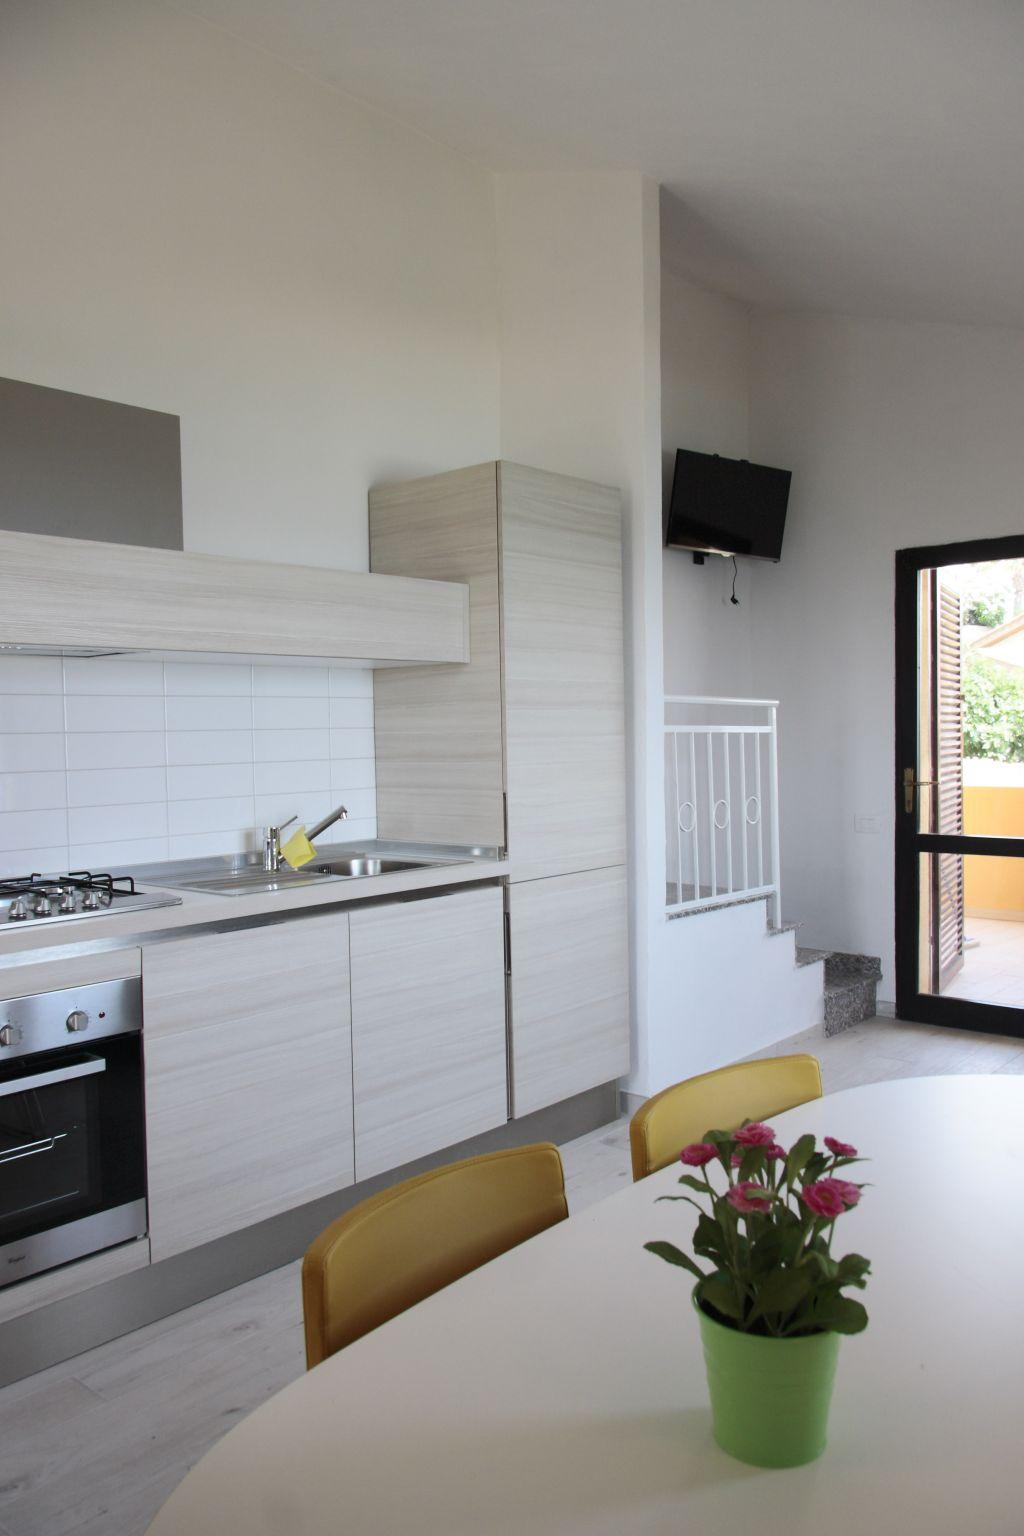 modernes kleinod mit toppanorama. Black Bedroom Furniture Sets. Home Design Ideas